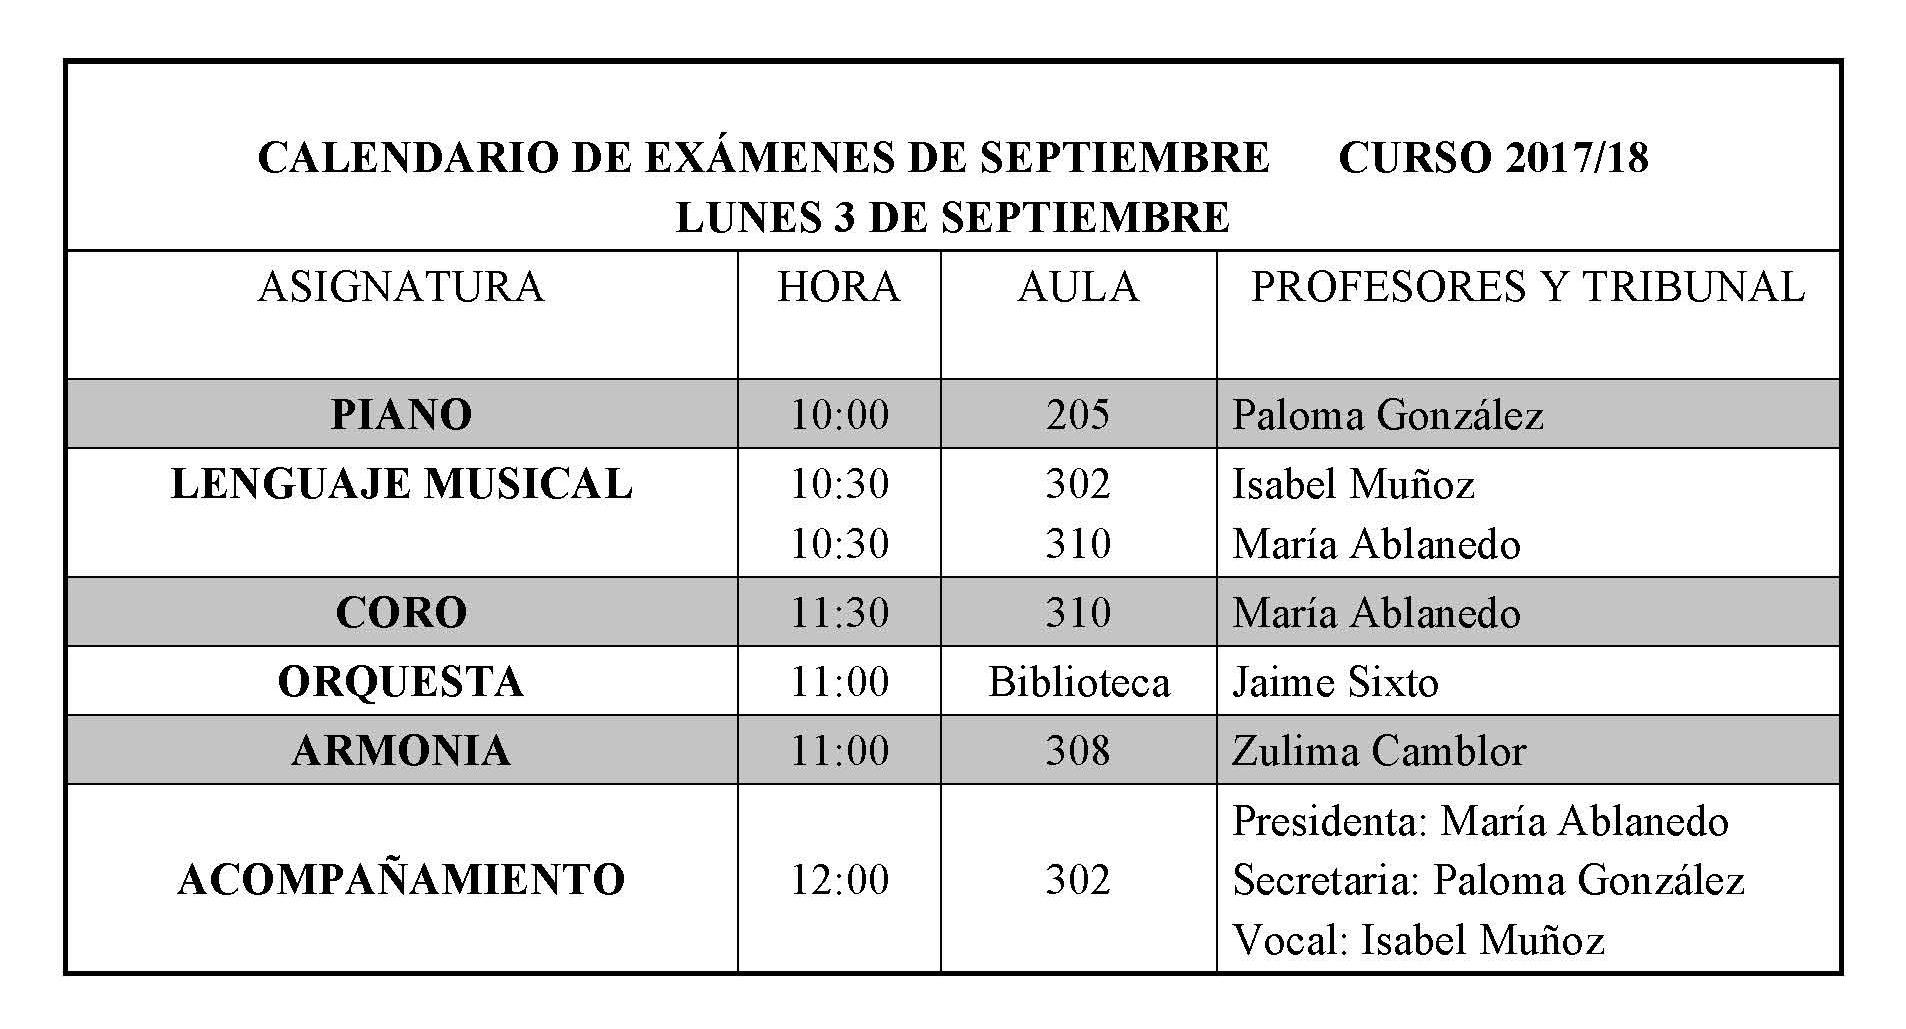 Calendario De Examenes.Calendario De Examenes De Septiembre Conservatorio Profesional De